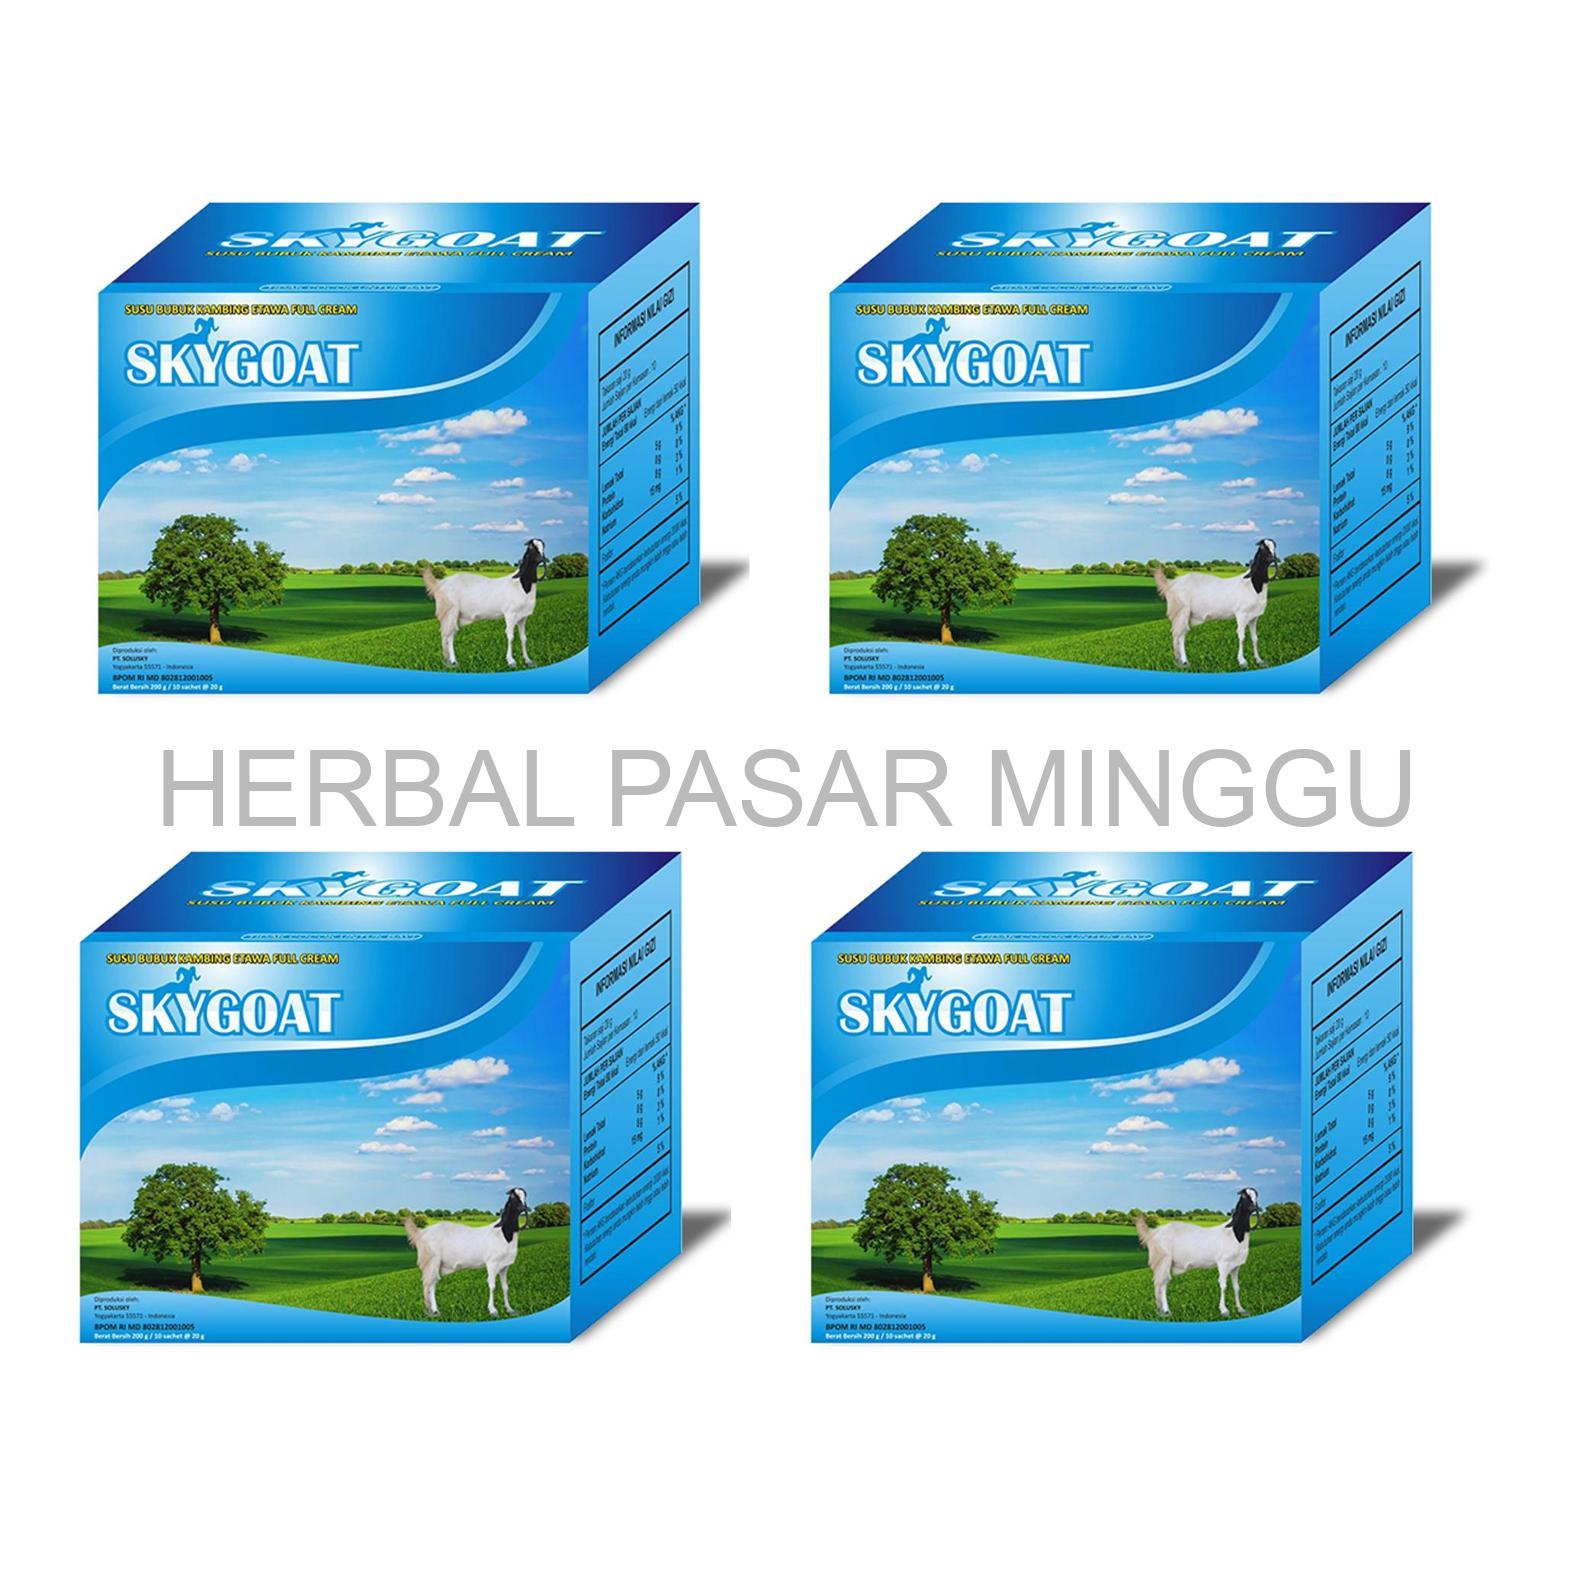 1 Paket Cream Susu Domba Csd Daftar Harga Terkini Dan Terlengkap Whitening Memutihkan Wajah Hilangkan Flex Dengan Vitamin E Aloe Vera H